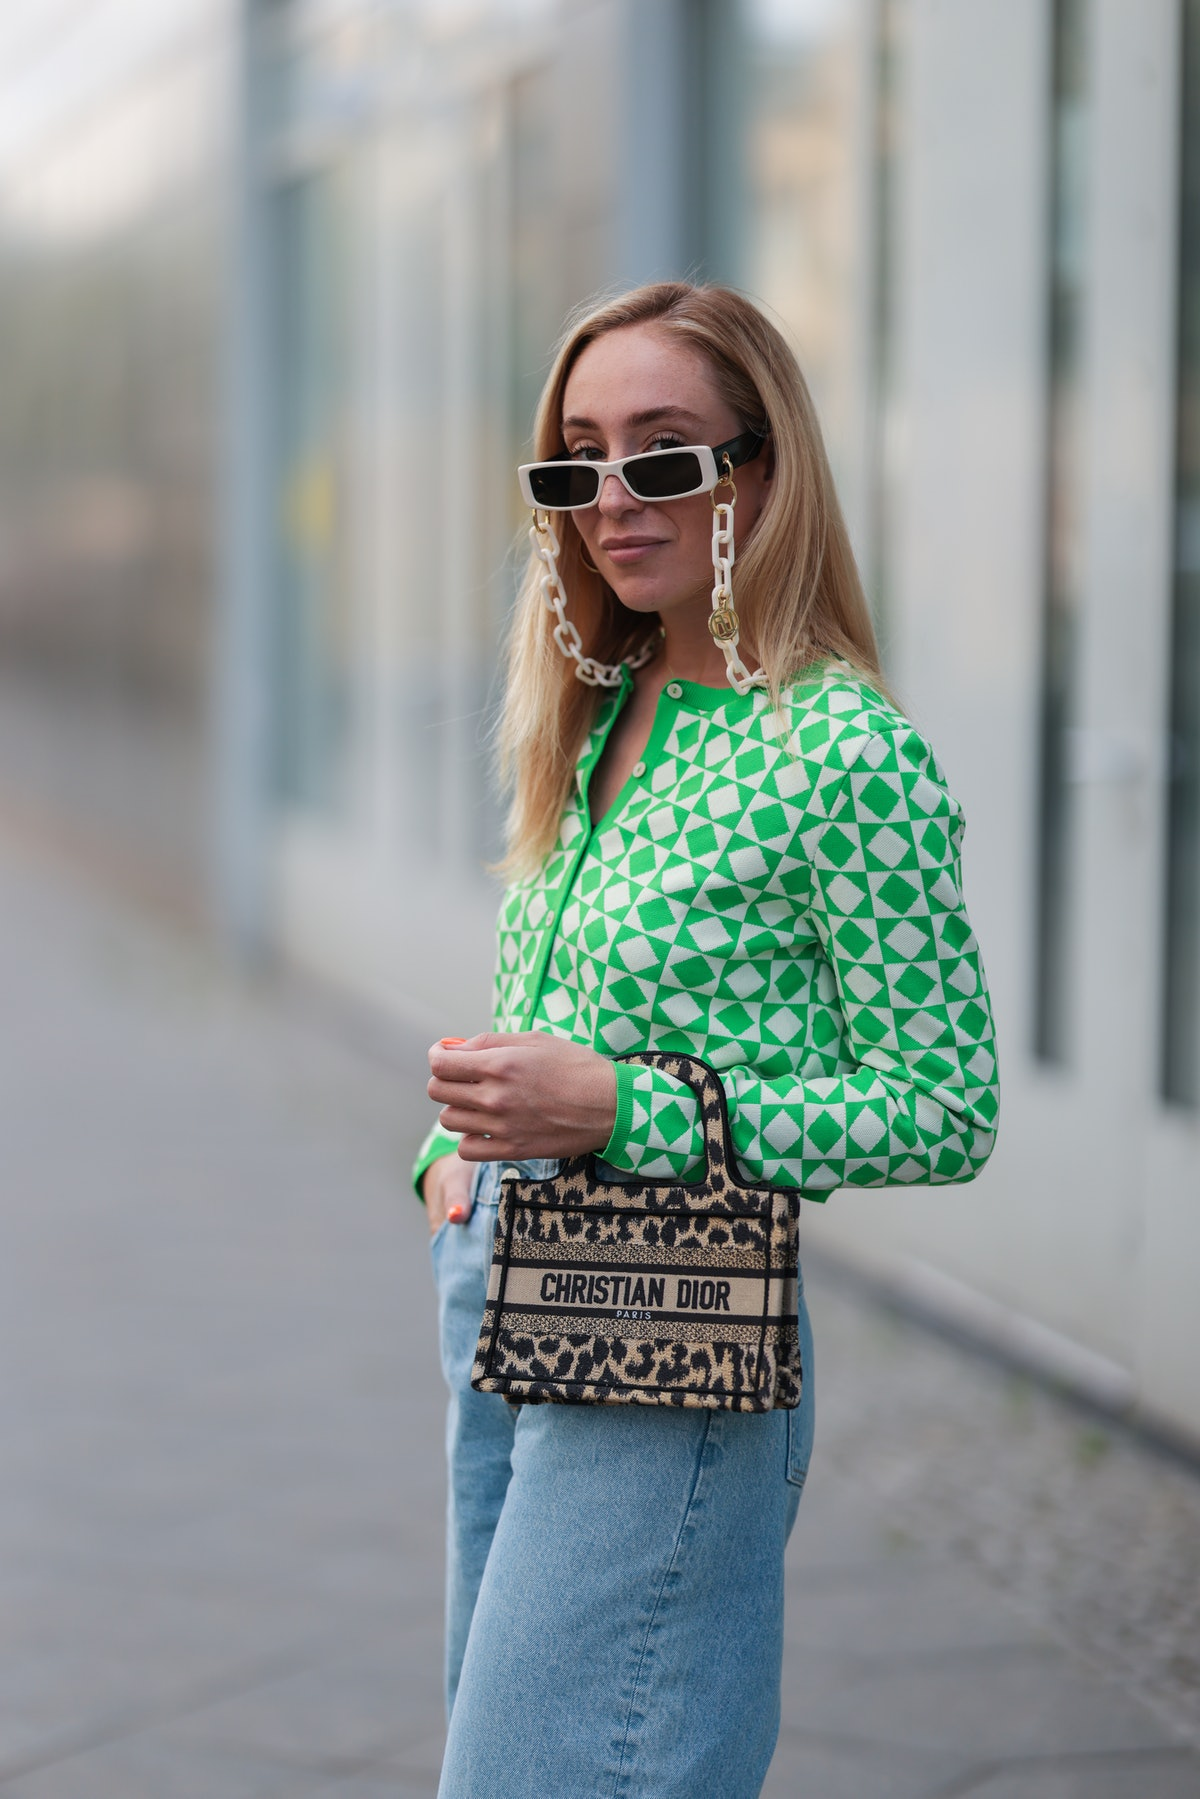 BERLIN, GERMANY - AUGUST 03: Sonia Lyson wearing Dior mini bag, green and white Zara cardigan, & oth...